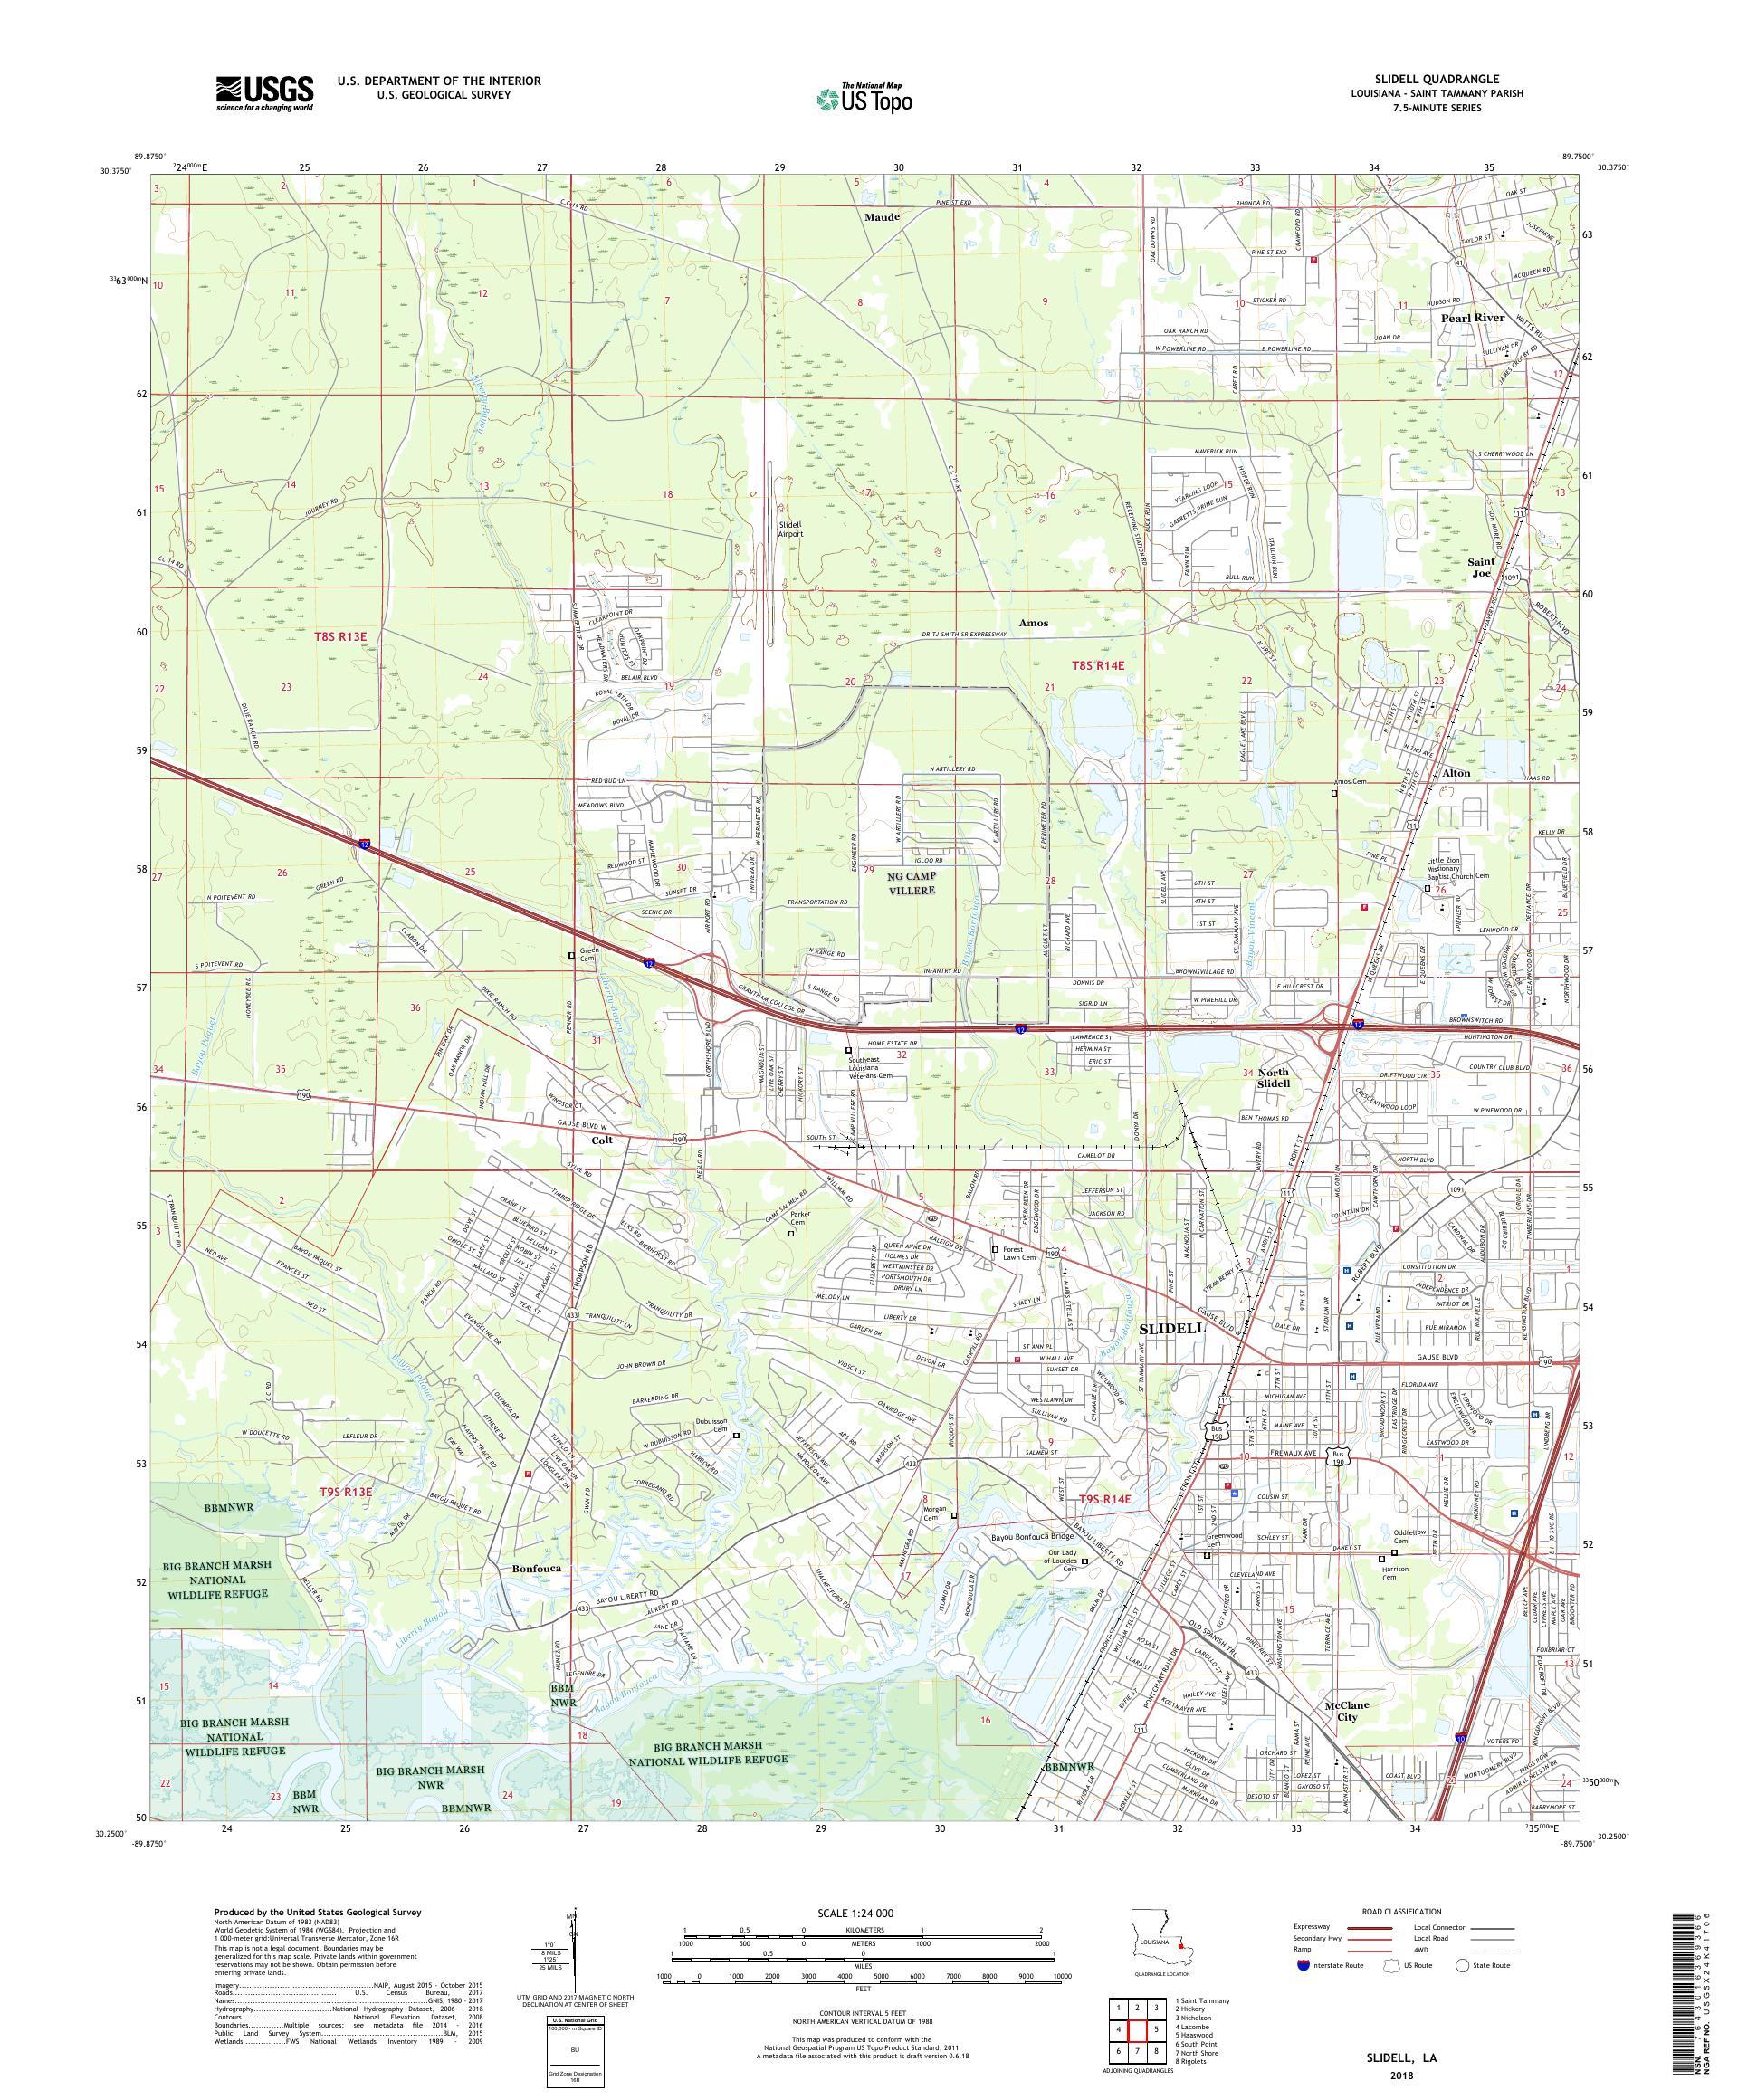 MyTopo Slidell, Louisiana USGS Quad Topo Map on